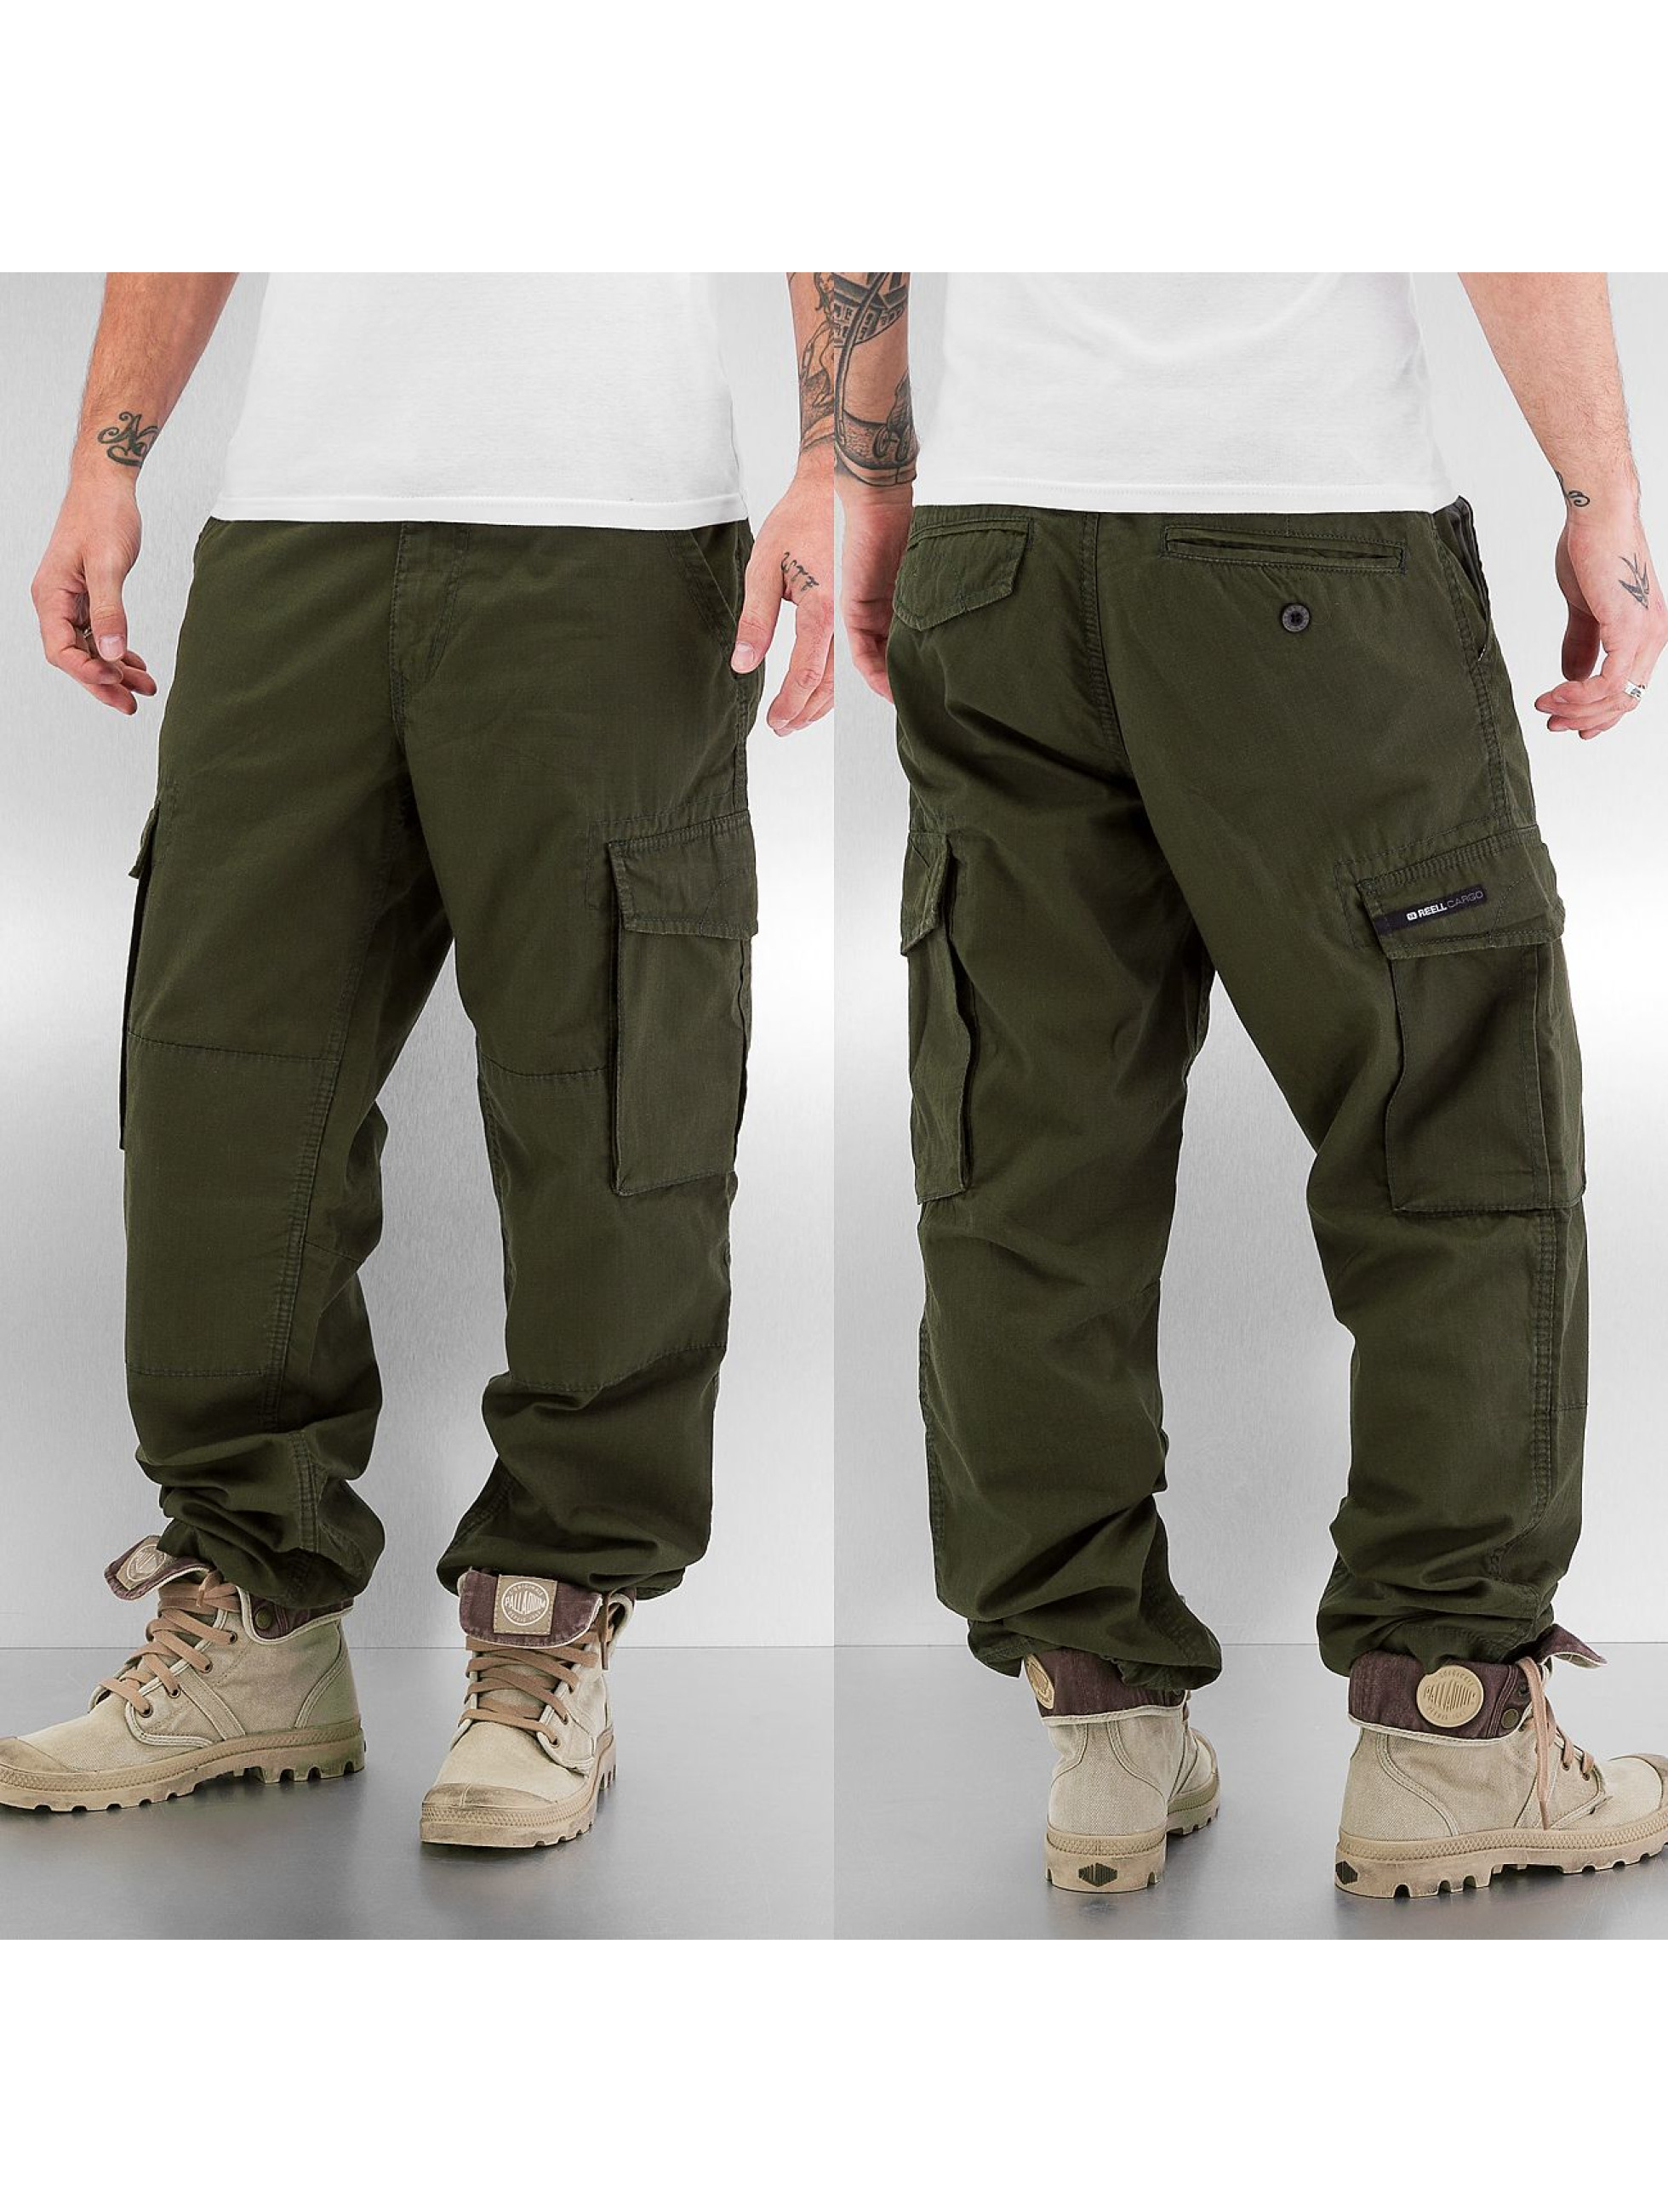 Reell Jeans Männer Cargohose Ripstop in grün